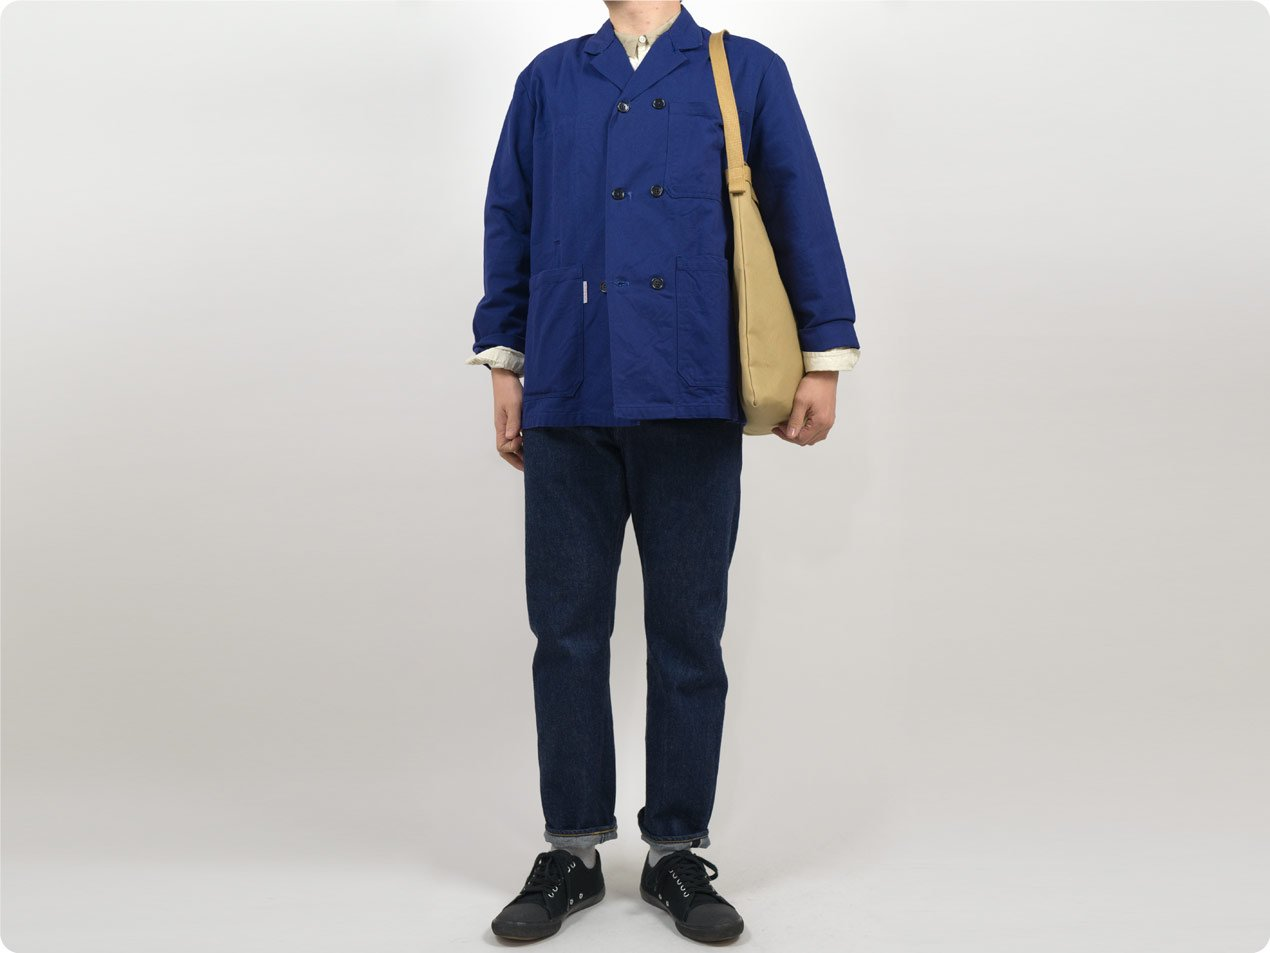 SOUTHERN FiELD INDUSTRiES Day Bag Khaki